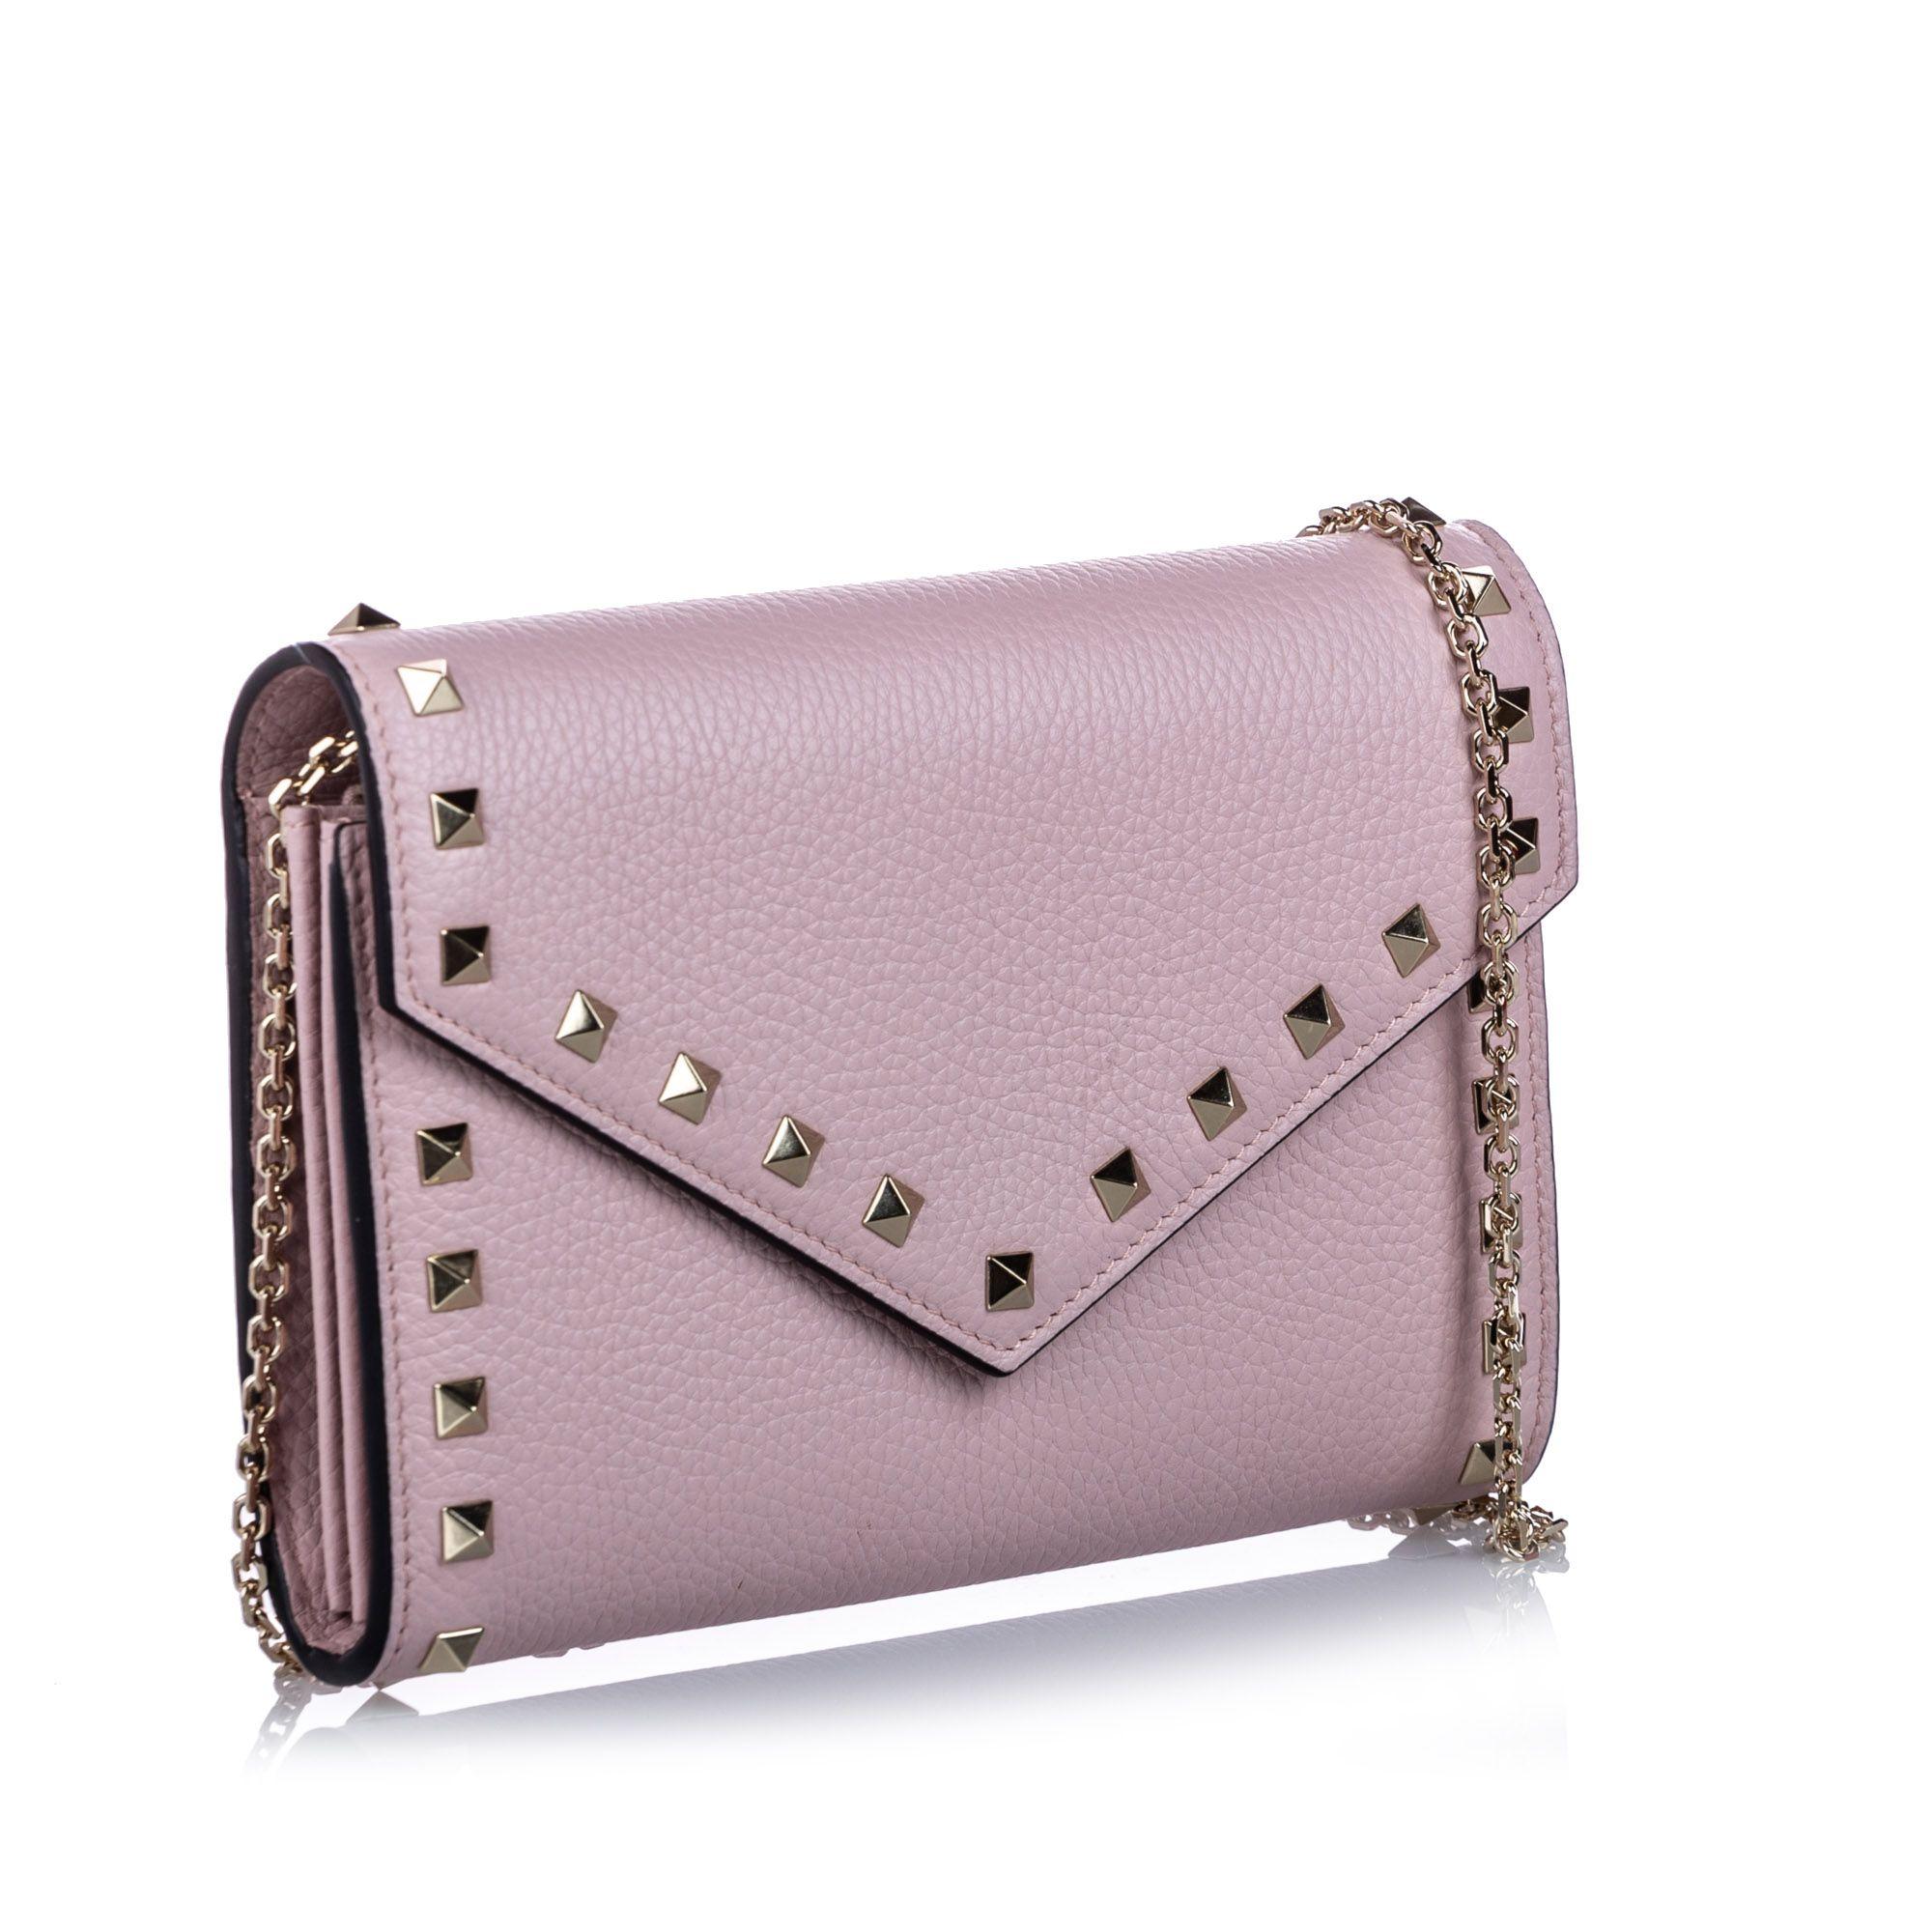 Vintage Valentino Rockstud Leather Wallet on Chain Pink